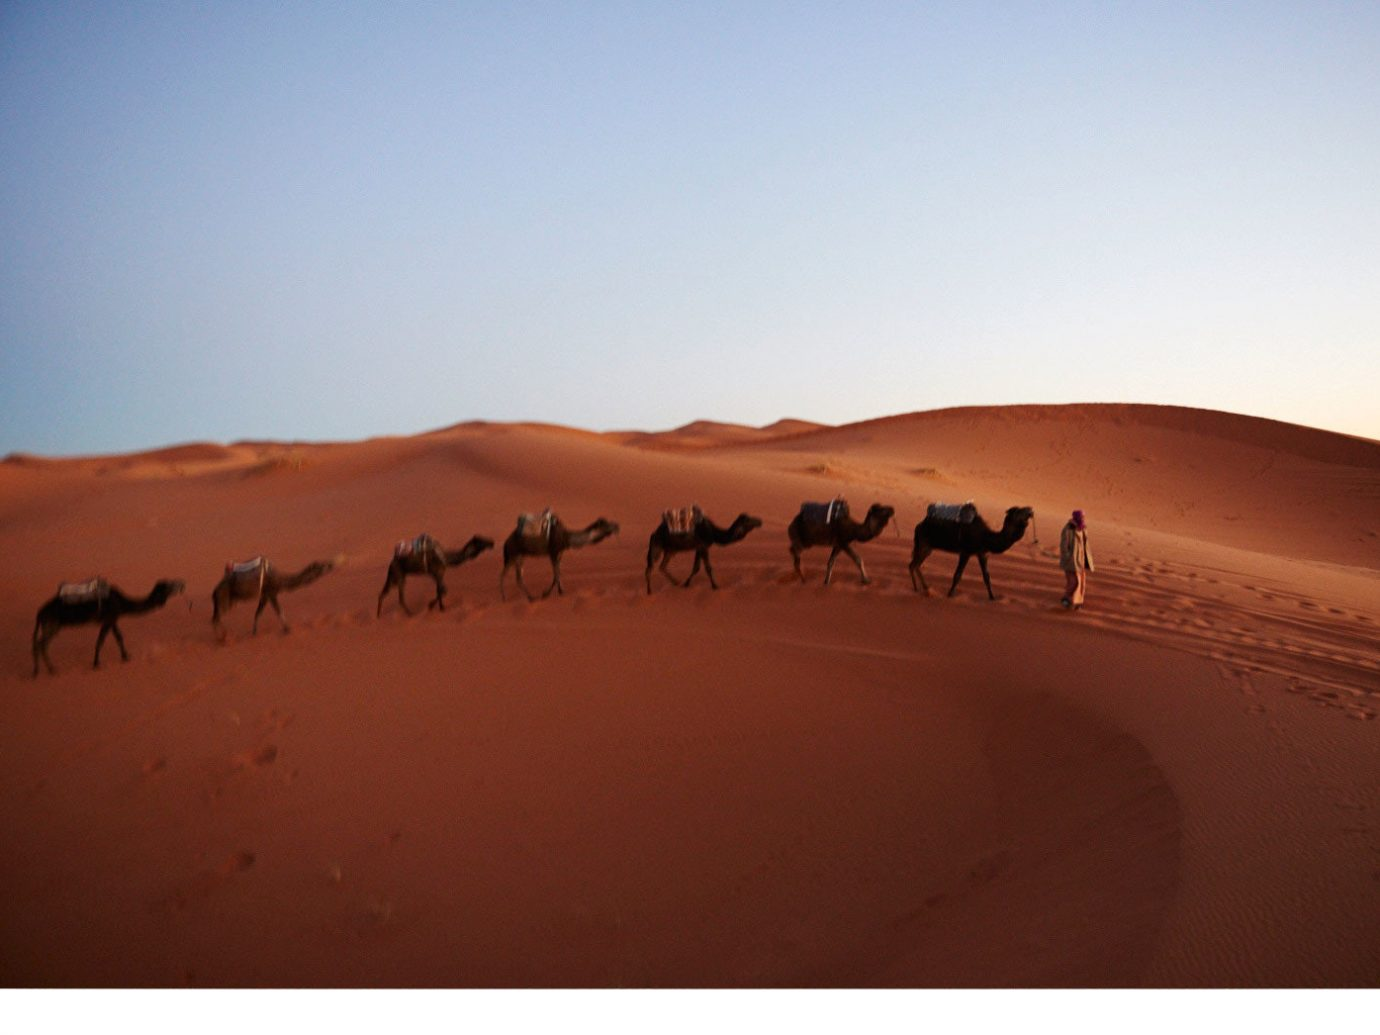 Jetsetter Guides Road Trips sky outdoor erg habitat sahara geographical feature natural environment Desert landform aeolian landform Beach Camel landscape grassland wadi plain camel like mammal sand plateau arabian camel sandy dune day